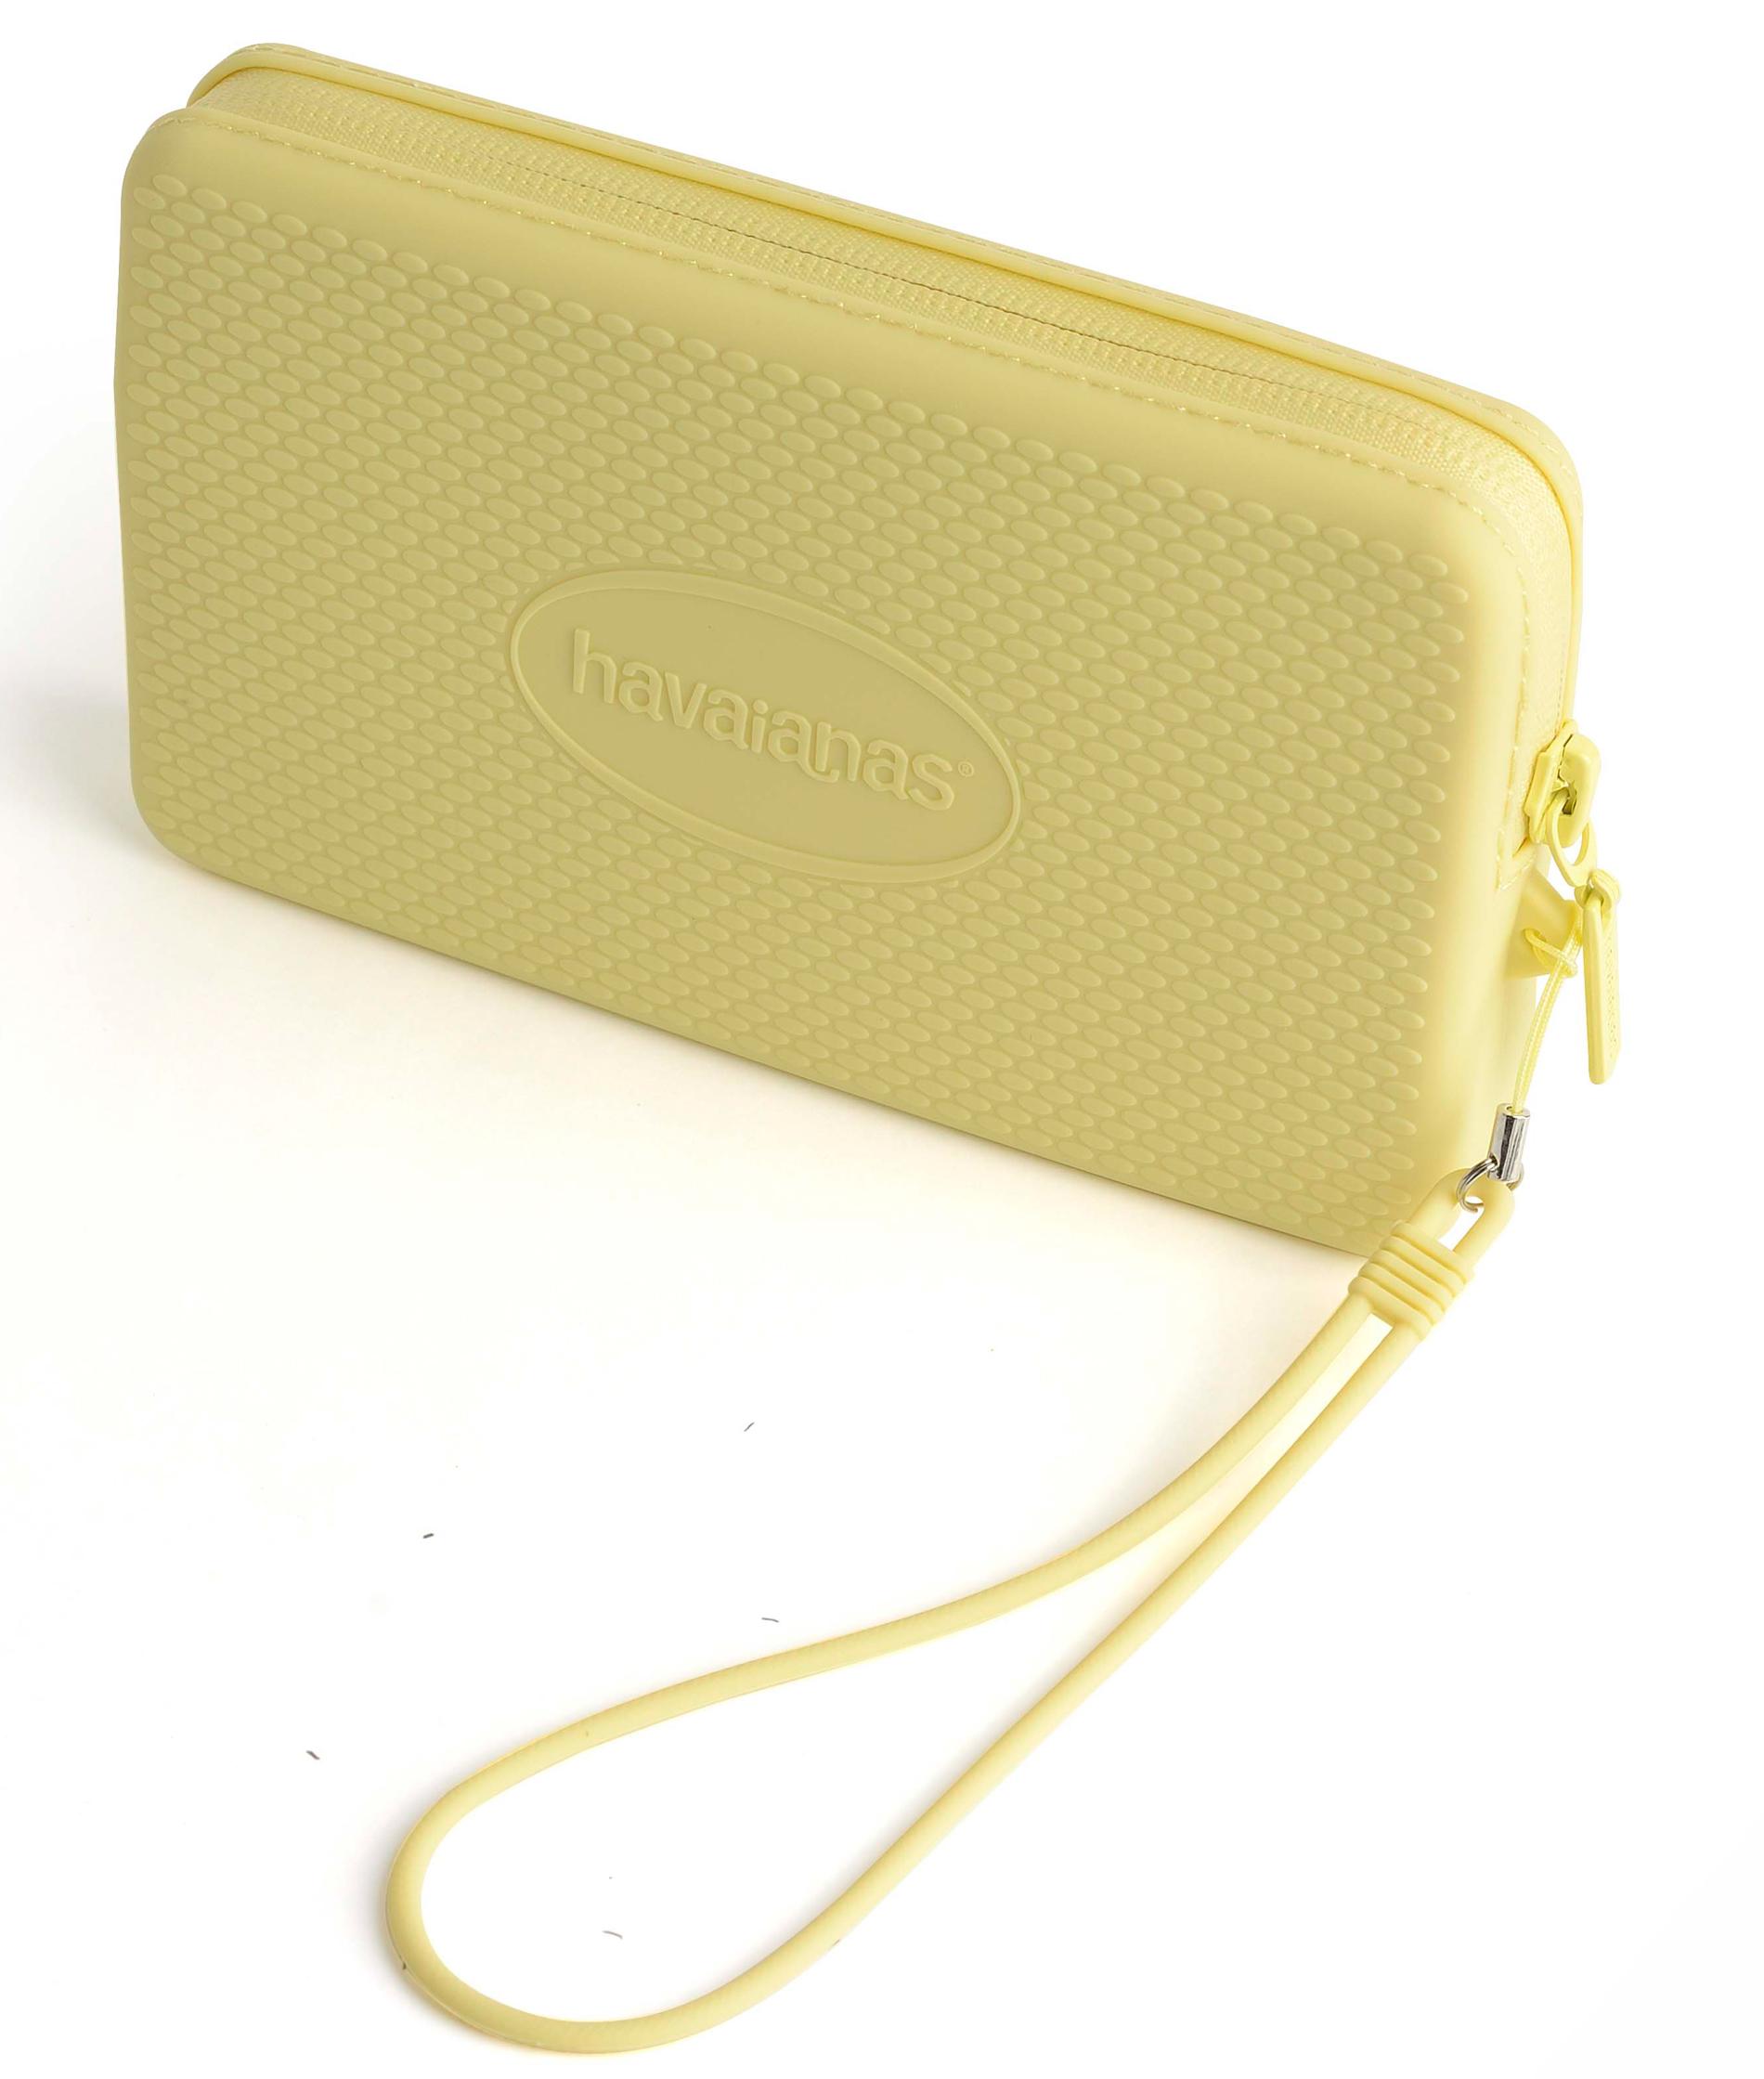 Havaianas Mini Bag Plus - Light Yellow